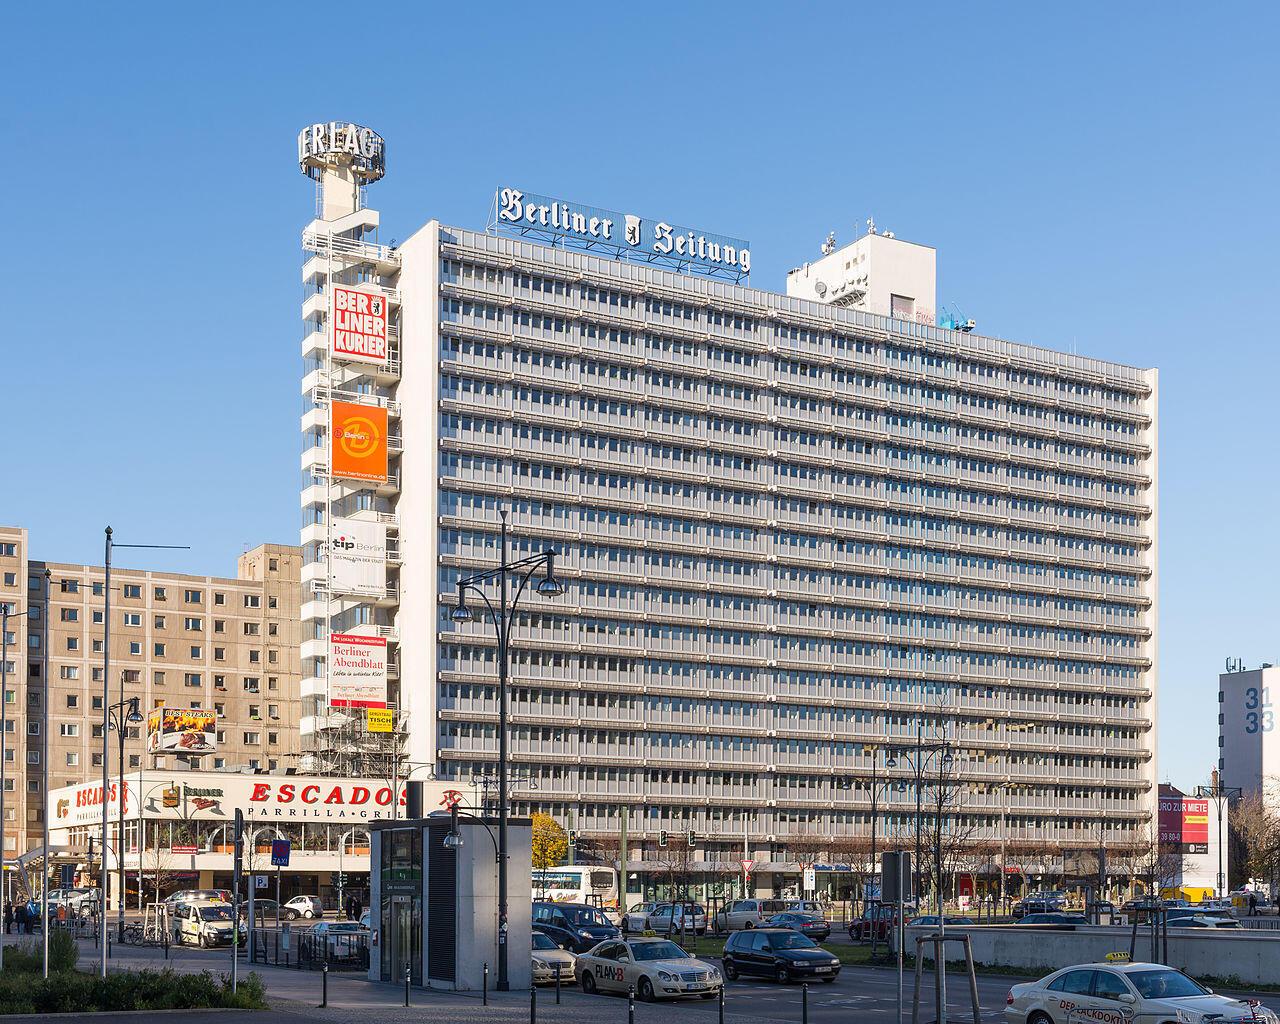 Trụ sở nhật báo Berliner Zeitung ở Berlin, Đức.